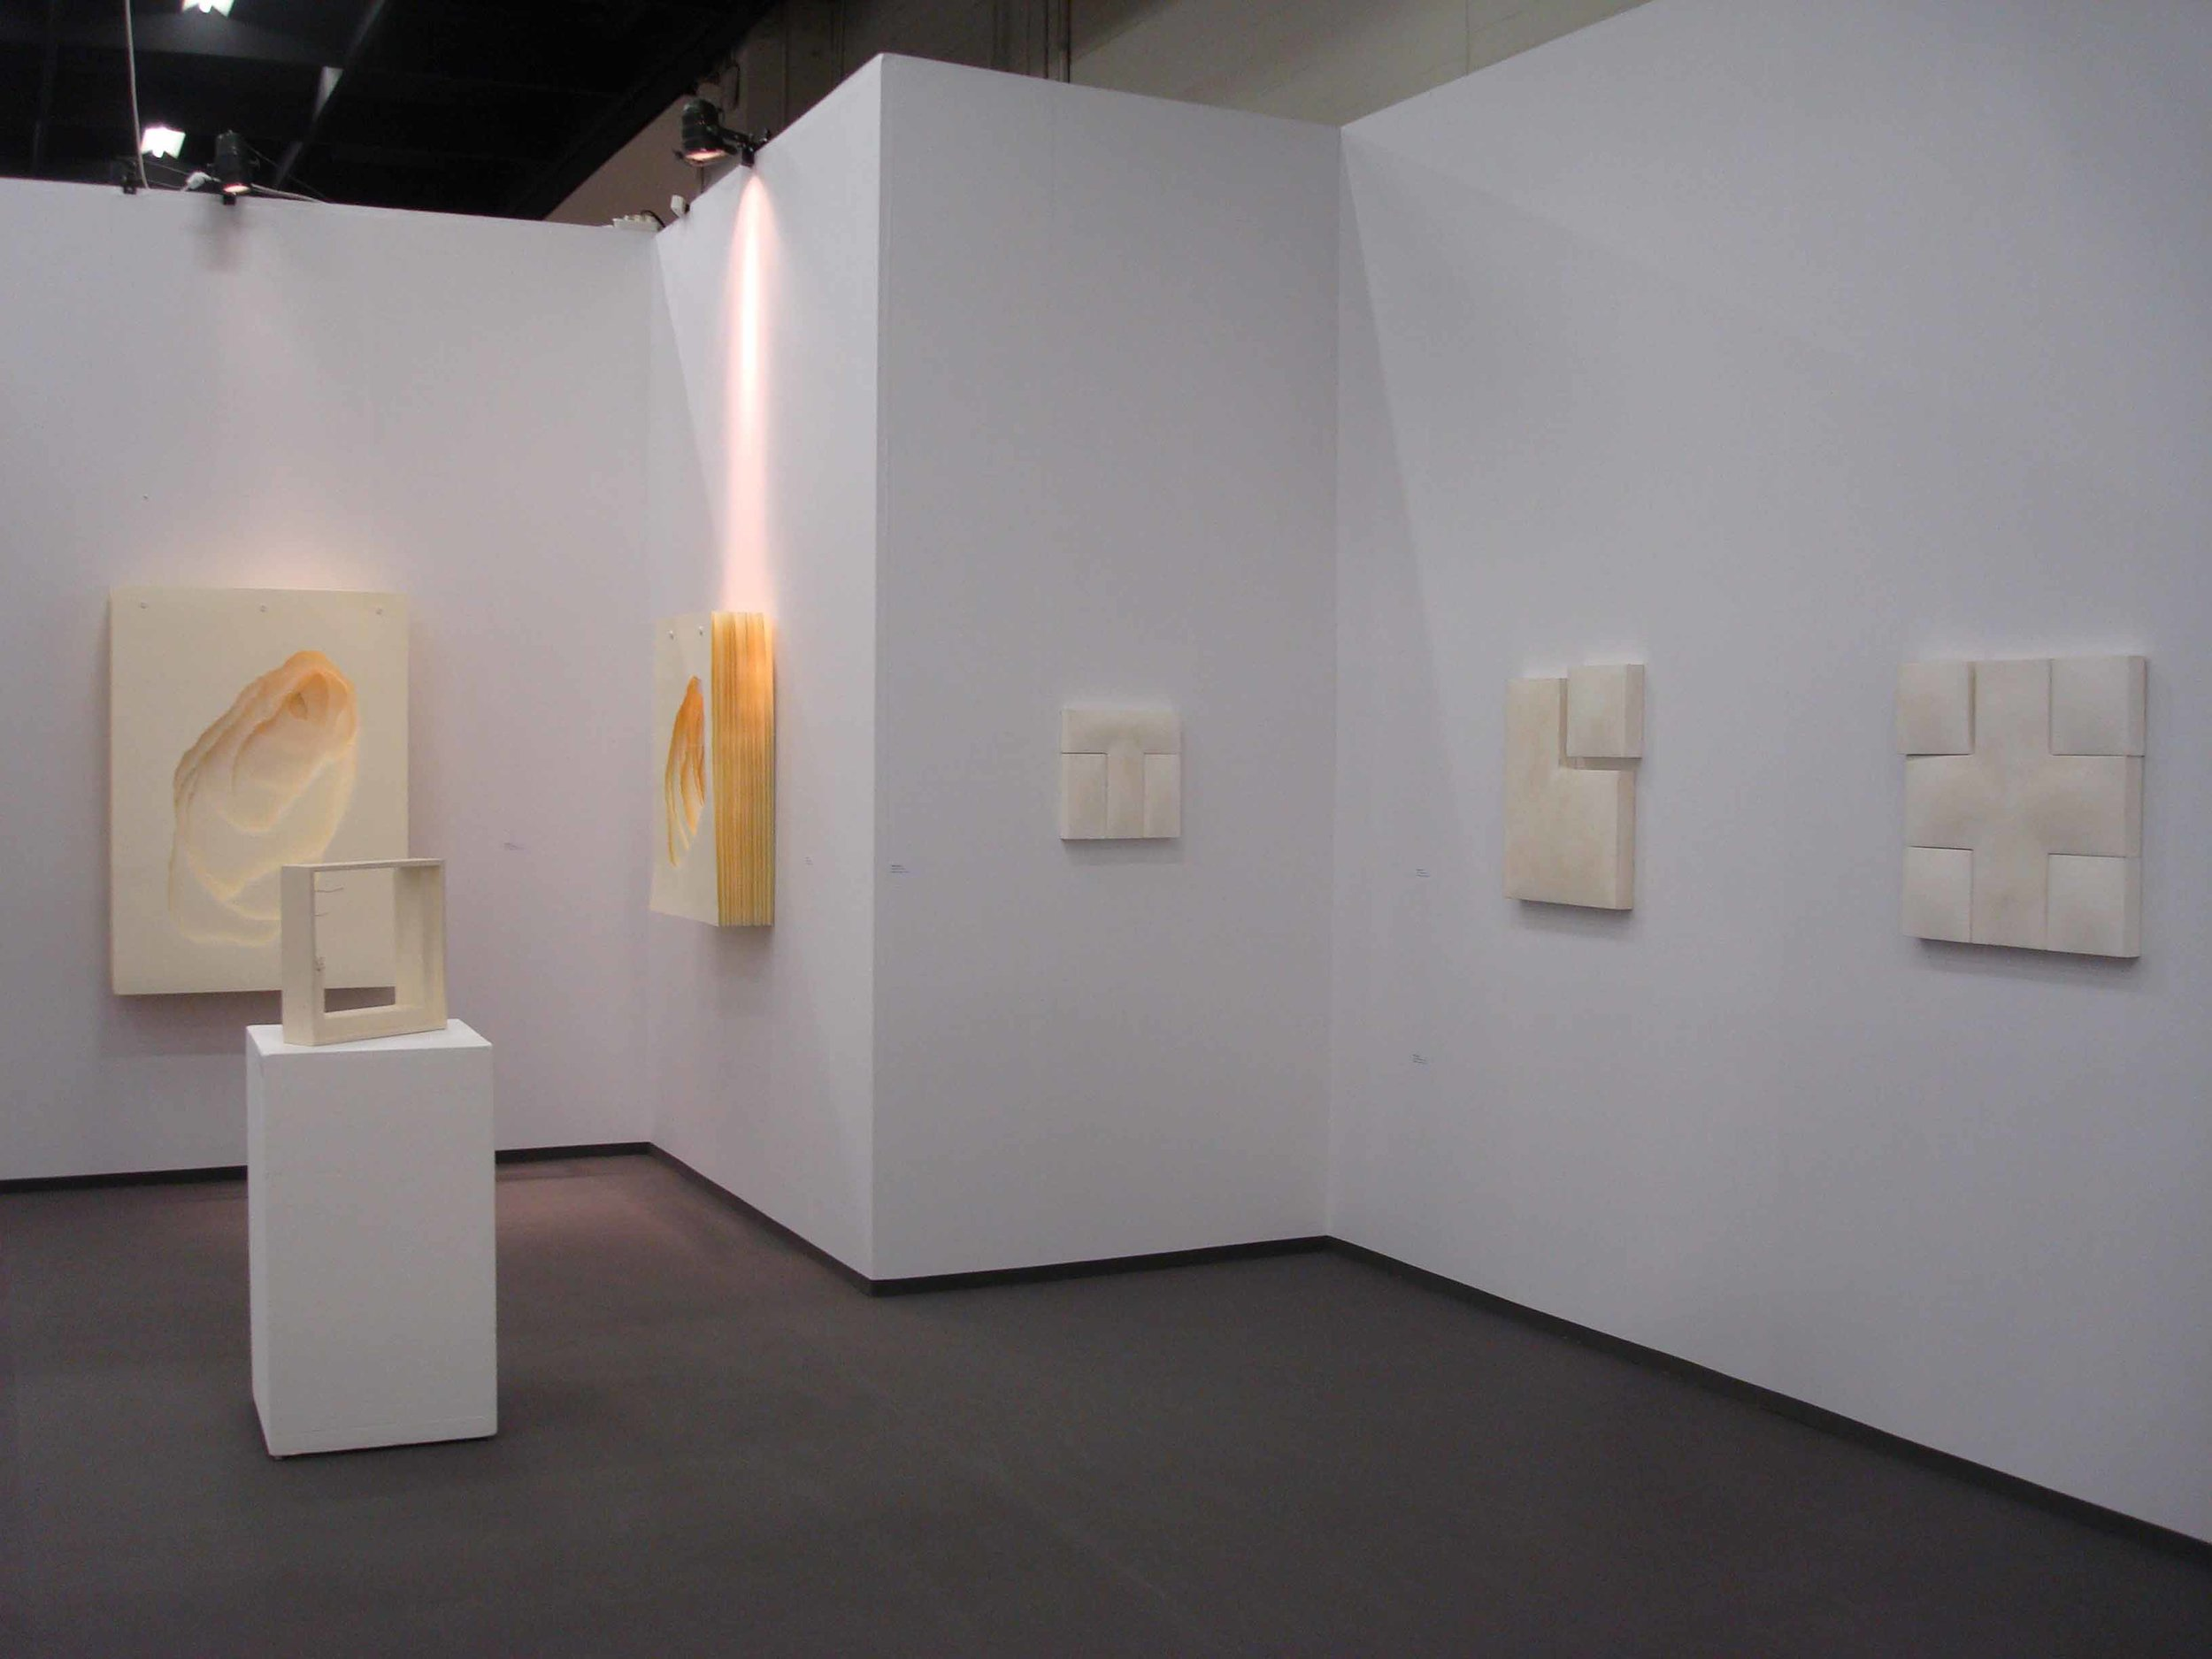 Stand White meditation room di Galleria Grossetti ad Art Cologne 2011_a sx Angela Glajcar e a dx Mats Bergquist .jpg